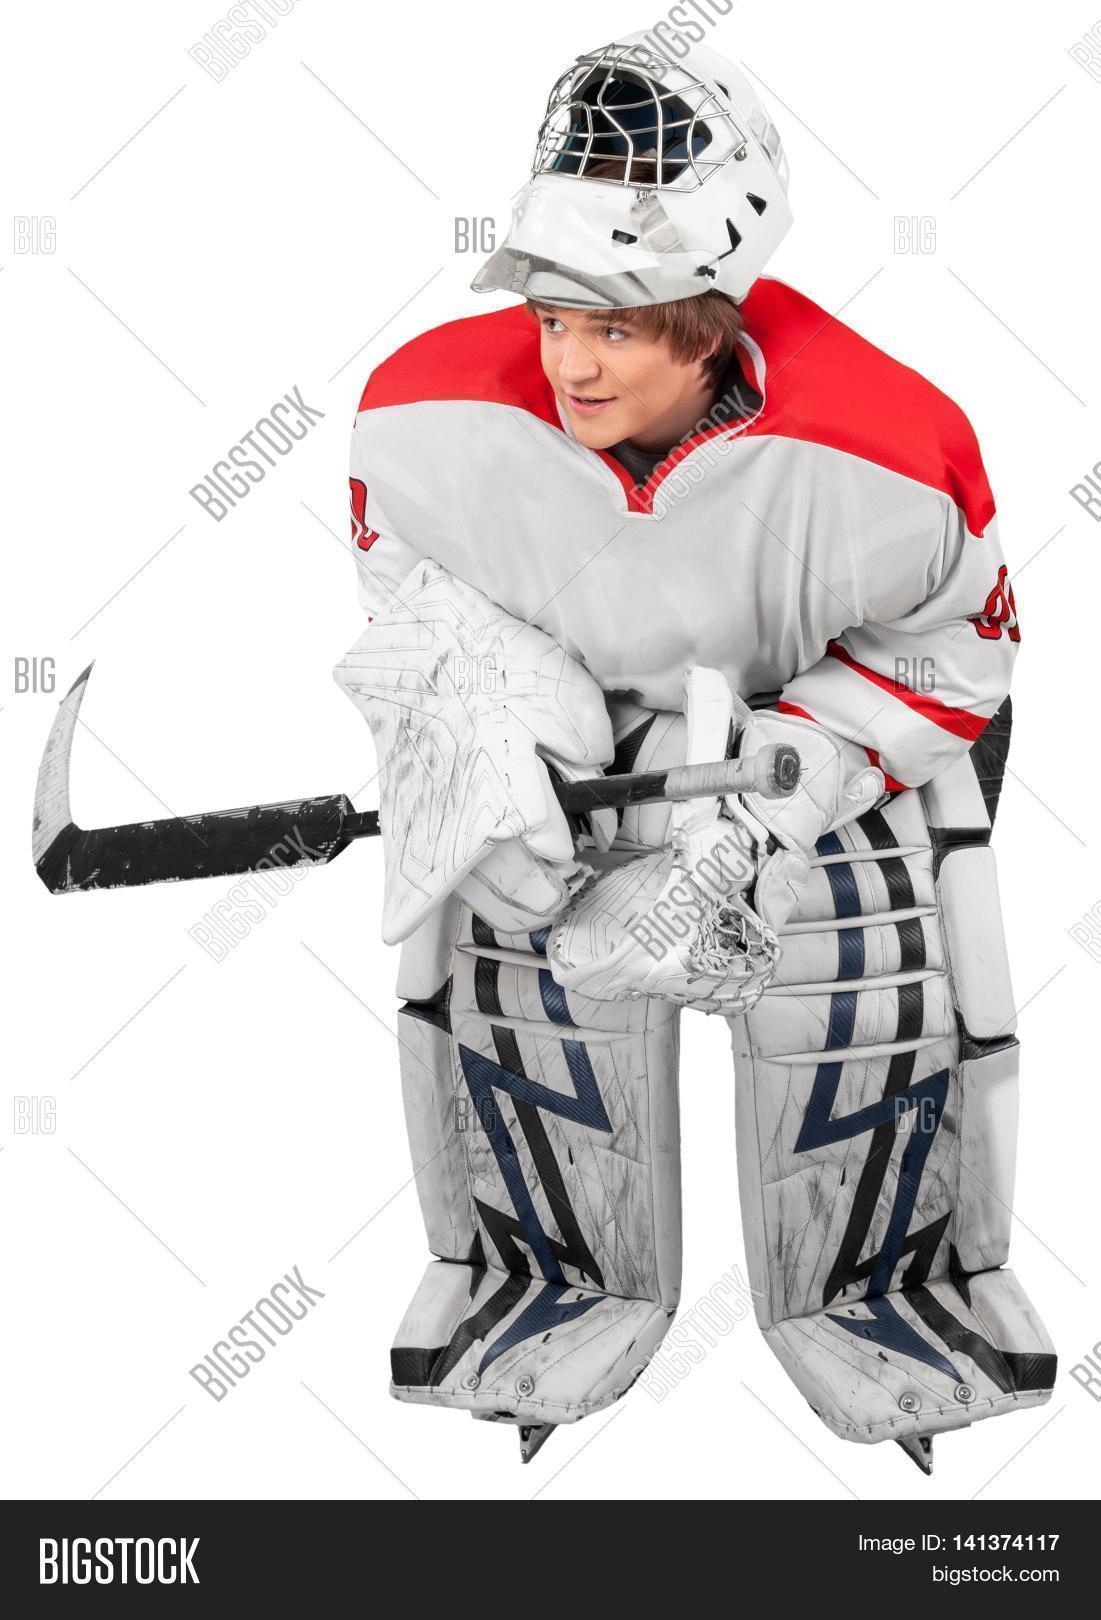 Ice Hockey Goalie Image Photo Free Trial Bigstock